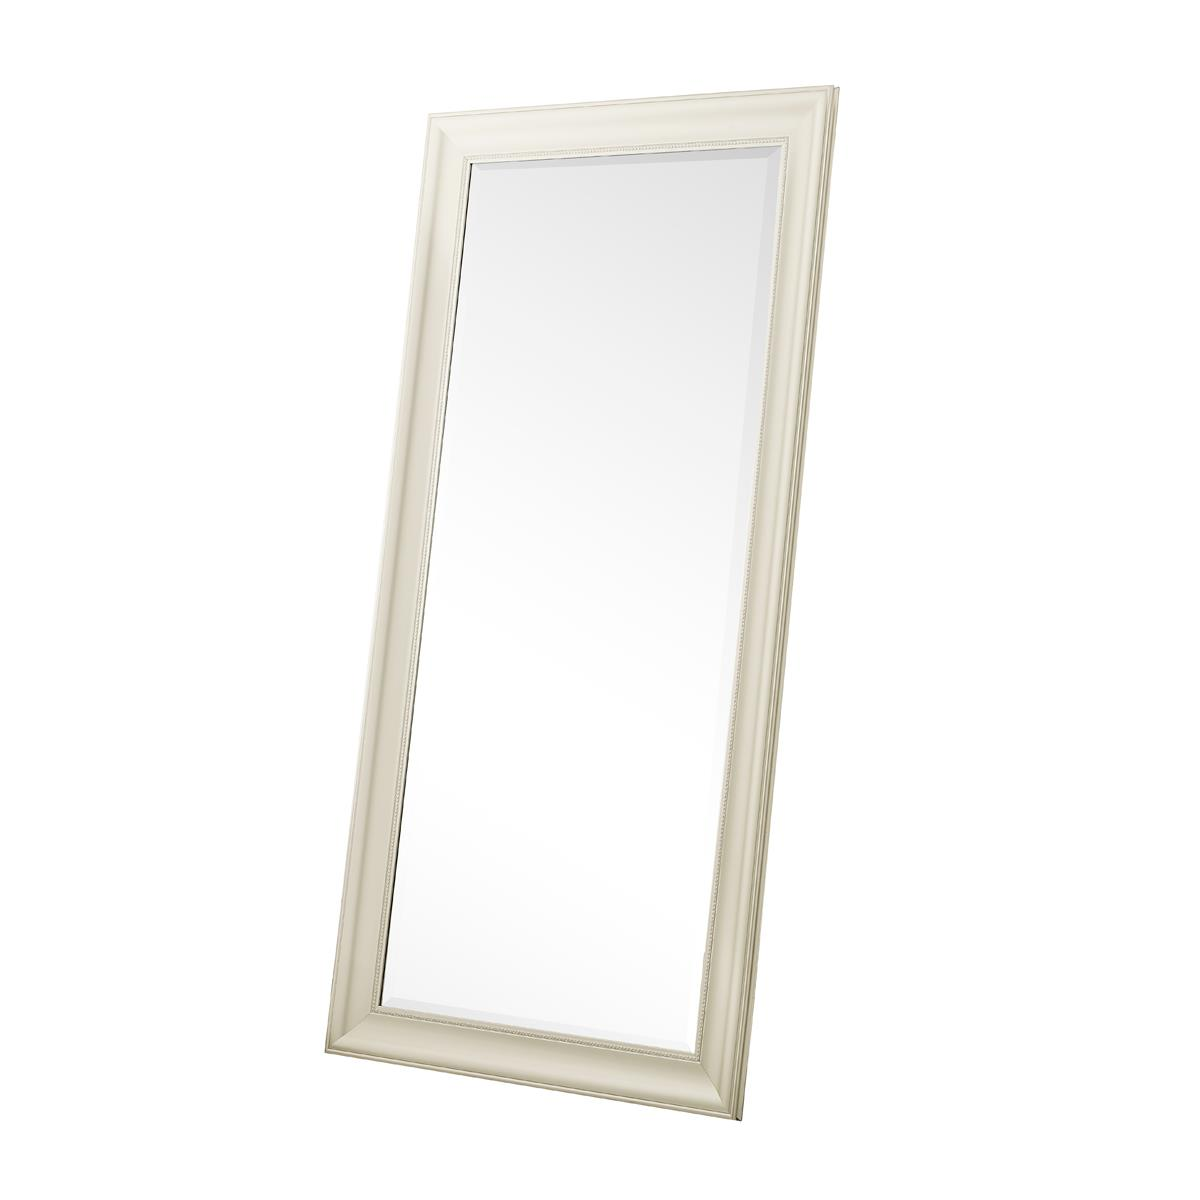 Beaded Framed Floor Mirror Silver 66 X 32 By Naomi Home Walmart Com Walmart Com